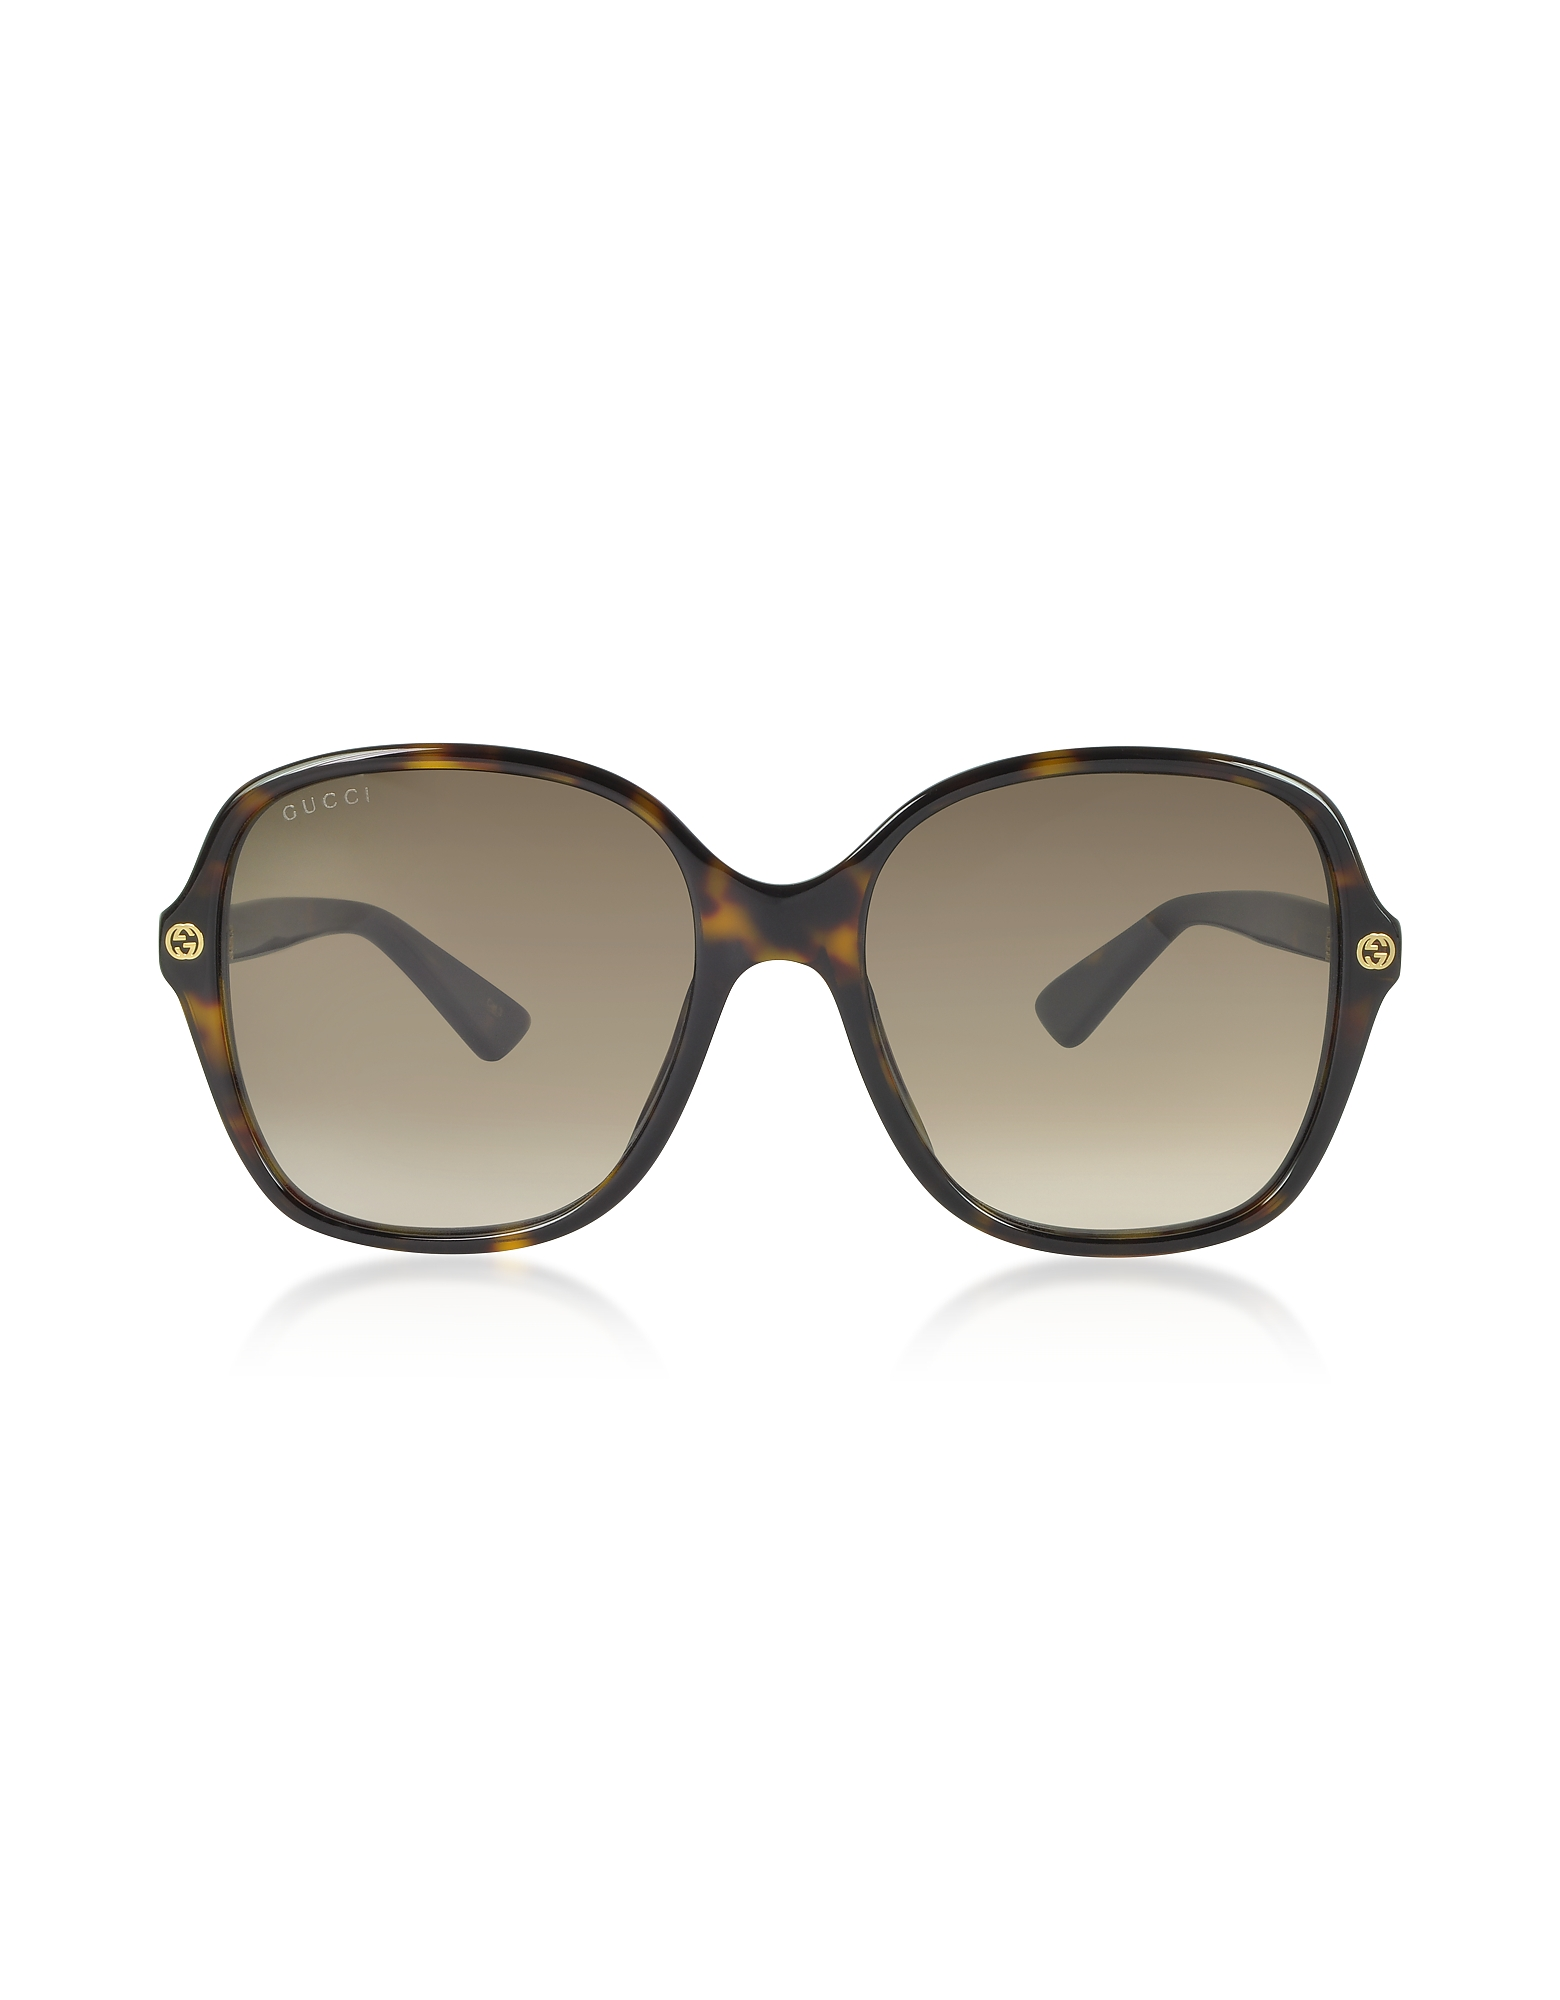 Squared-frame Acetate Sunglasses